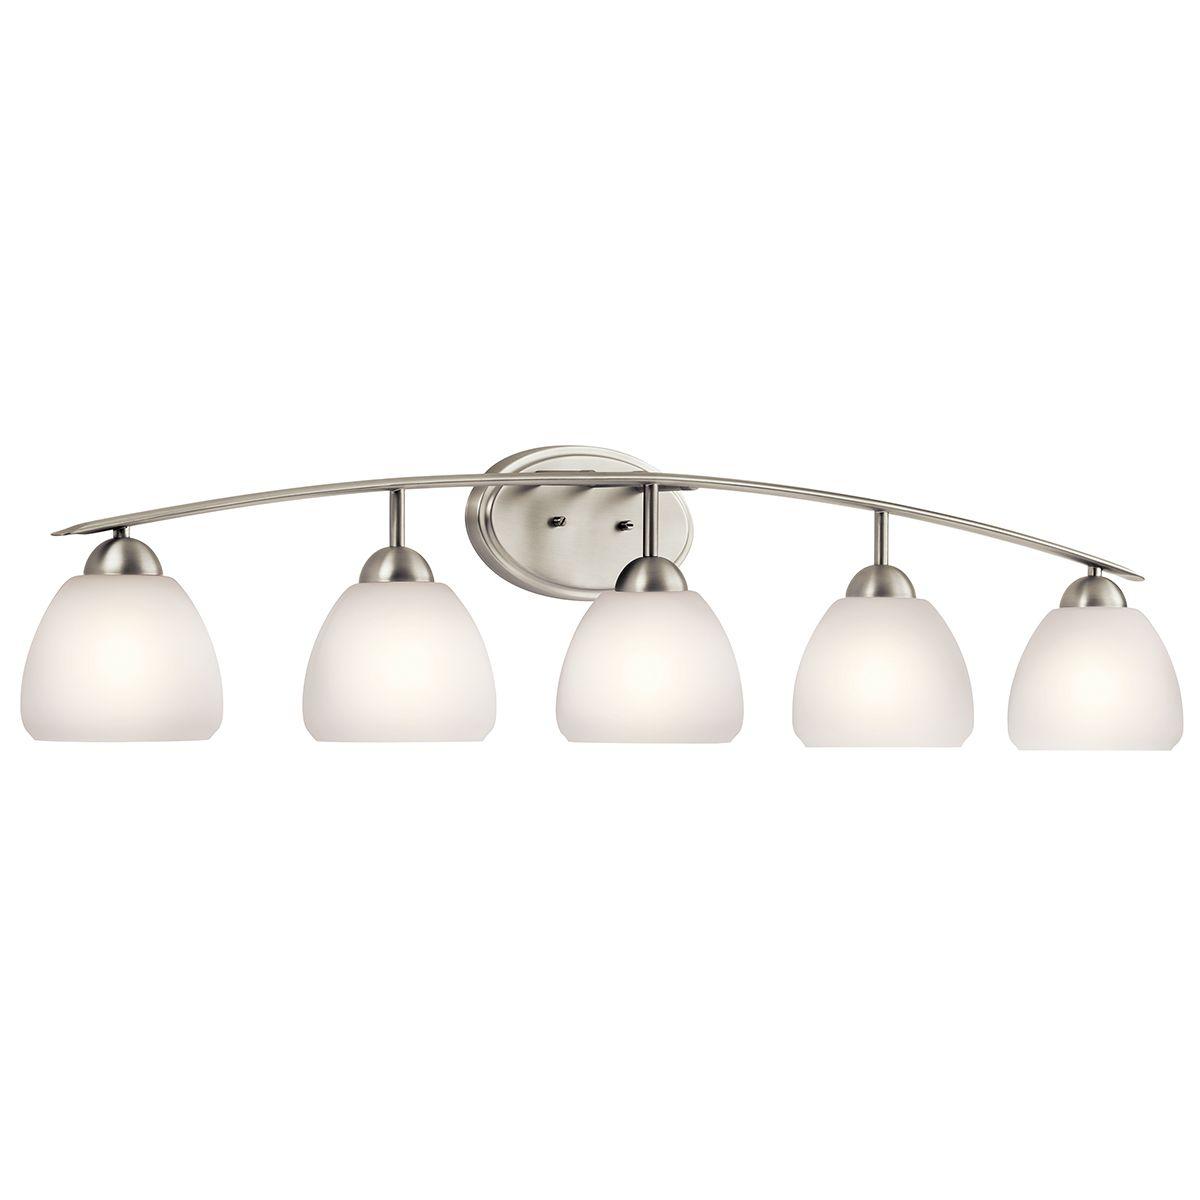 Stupendous Kichler Calleigh 5 Light Bathroom Vanity Light In Brushed Nickel Interior Design Ideas Clesiryabchikinfo